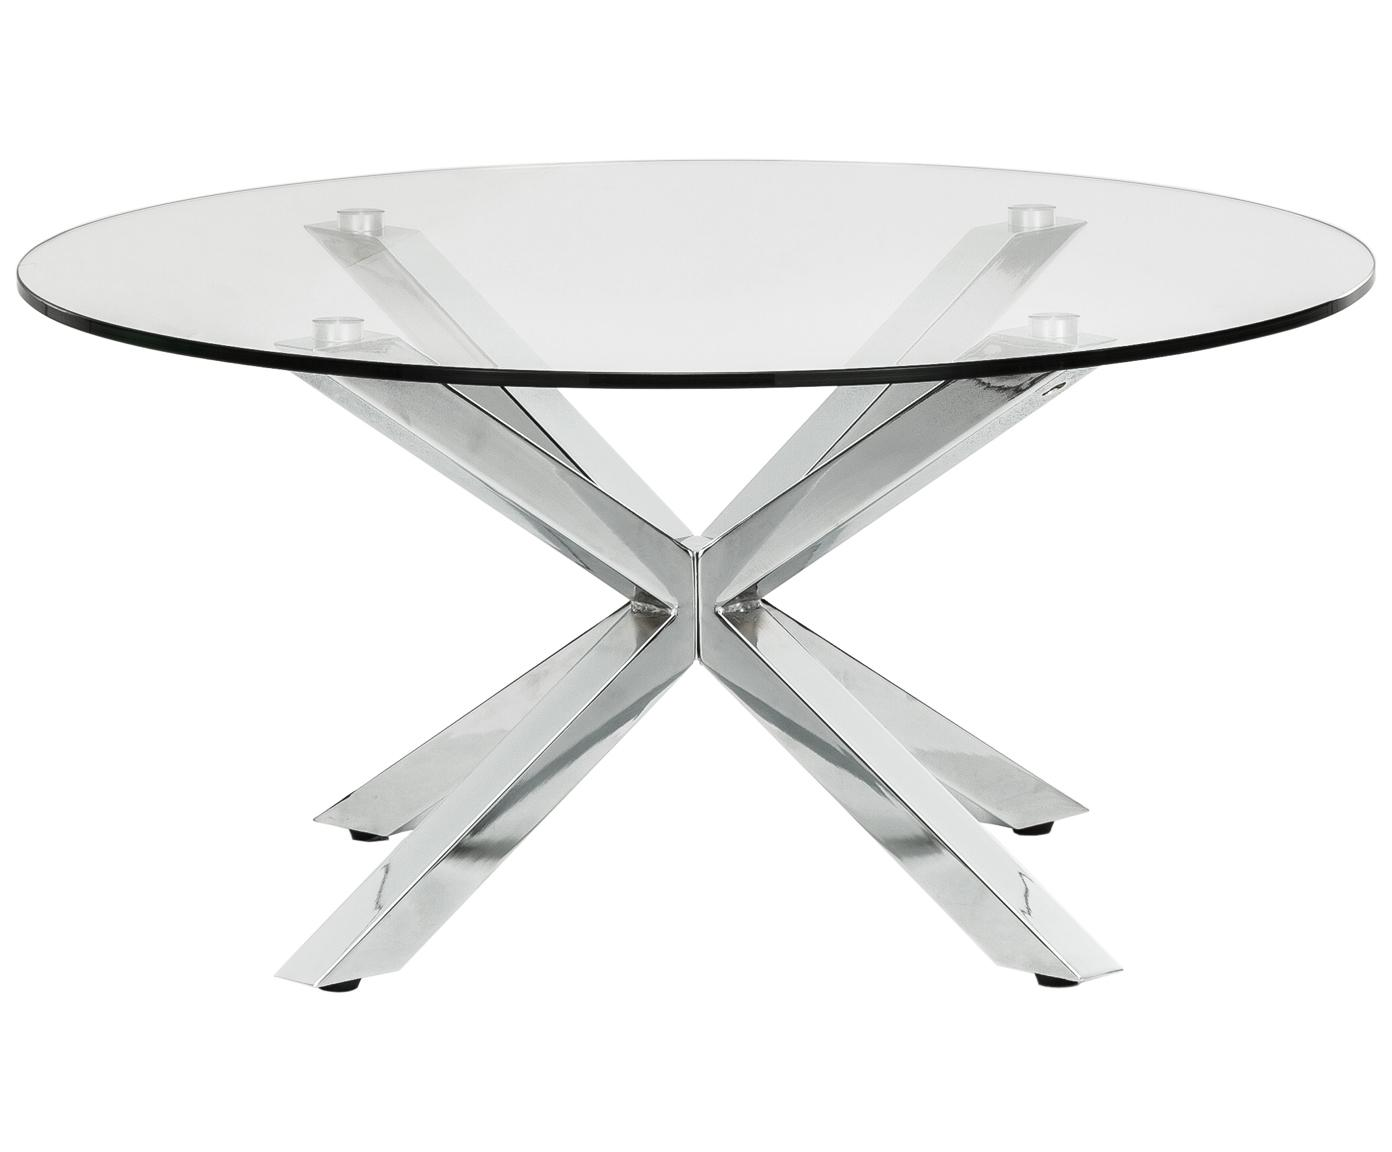 Mesa de centro Emilie, tablero de cristal, Tablero: vidrio, Patas: metal cromado, Transparente, cromo, Ø 82 x Al 40 cm